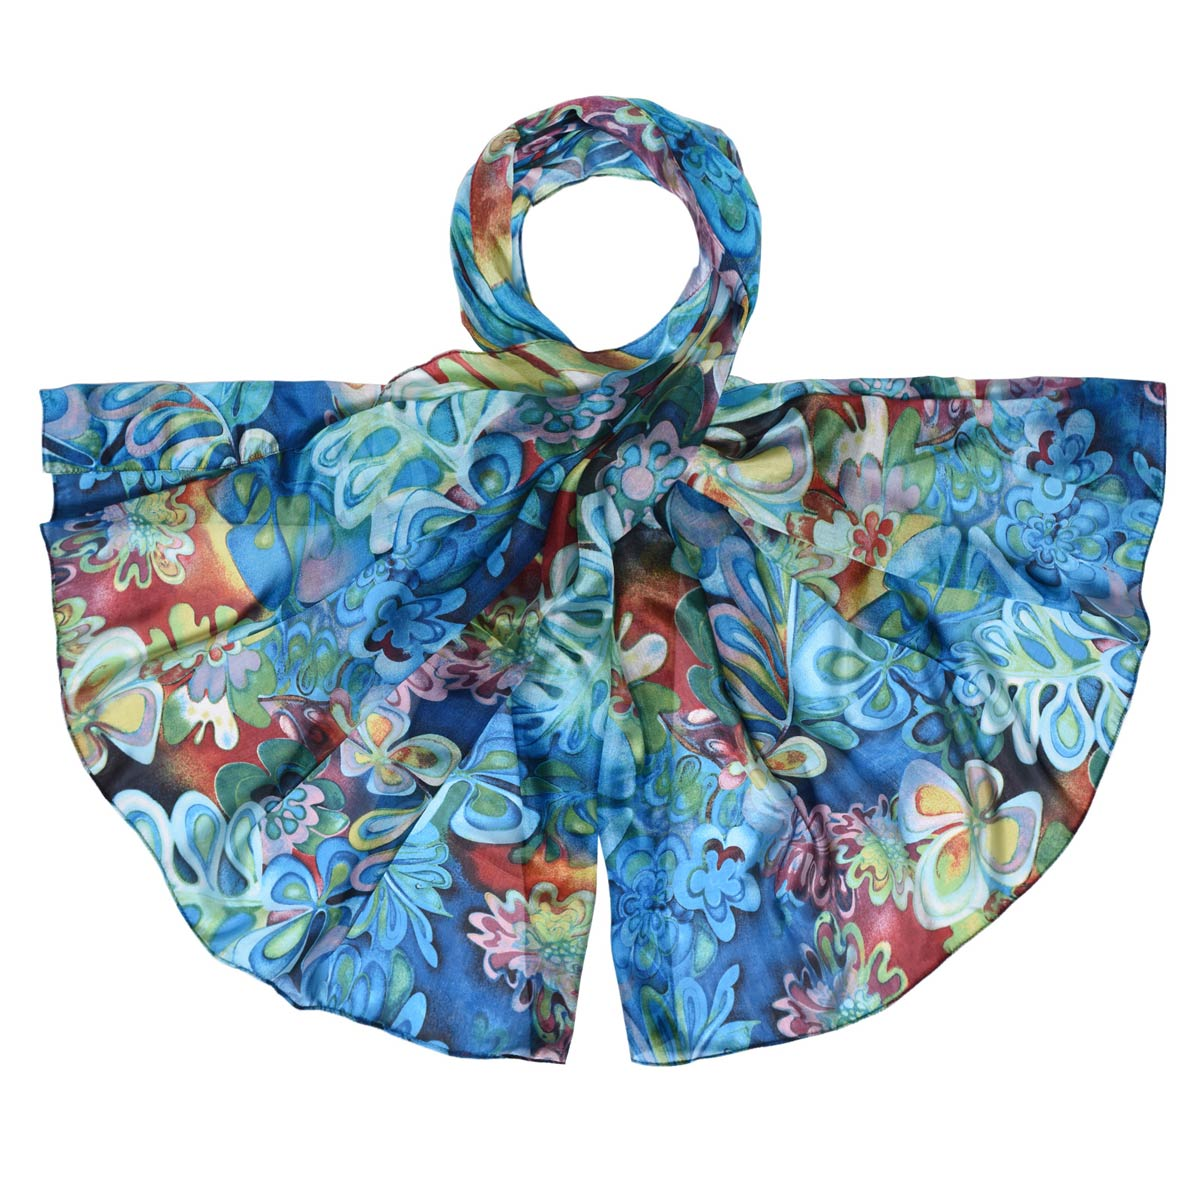 _Etole-soie-bleue-fleurs-fantaisie